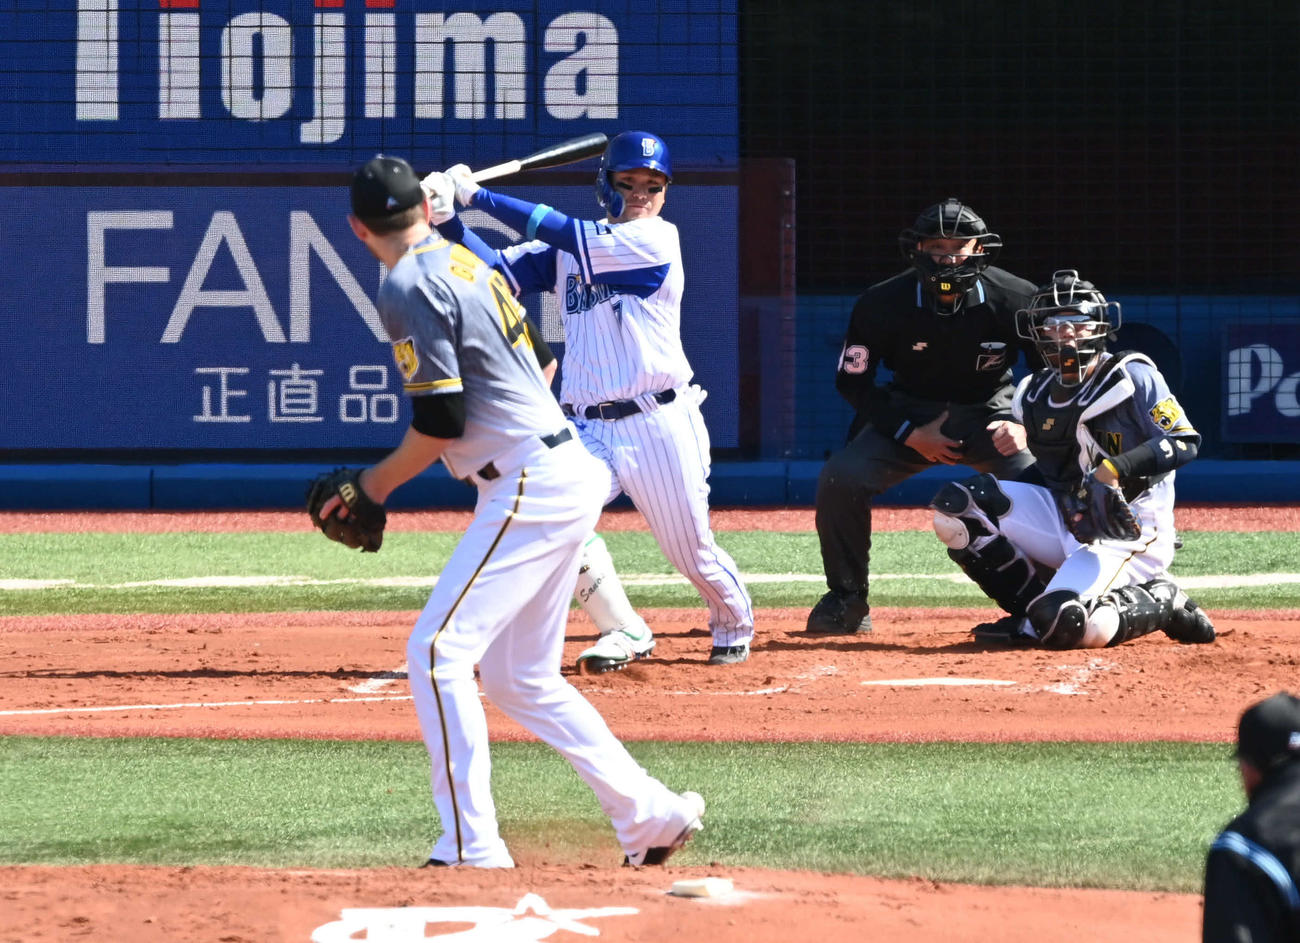 DeNA対阪神 1回裏DeNA2死一塁、佐野の打球がガンケルの右足に当たり、三ゴロとなる(撮影・山崎安昭)